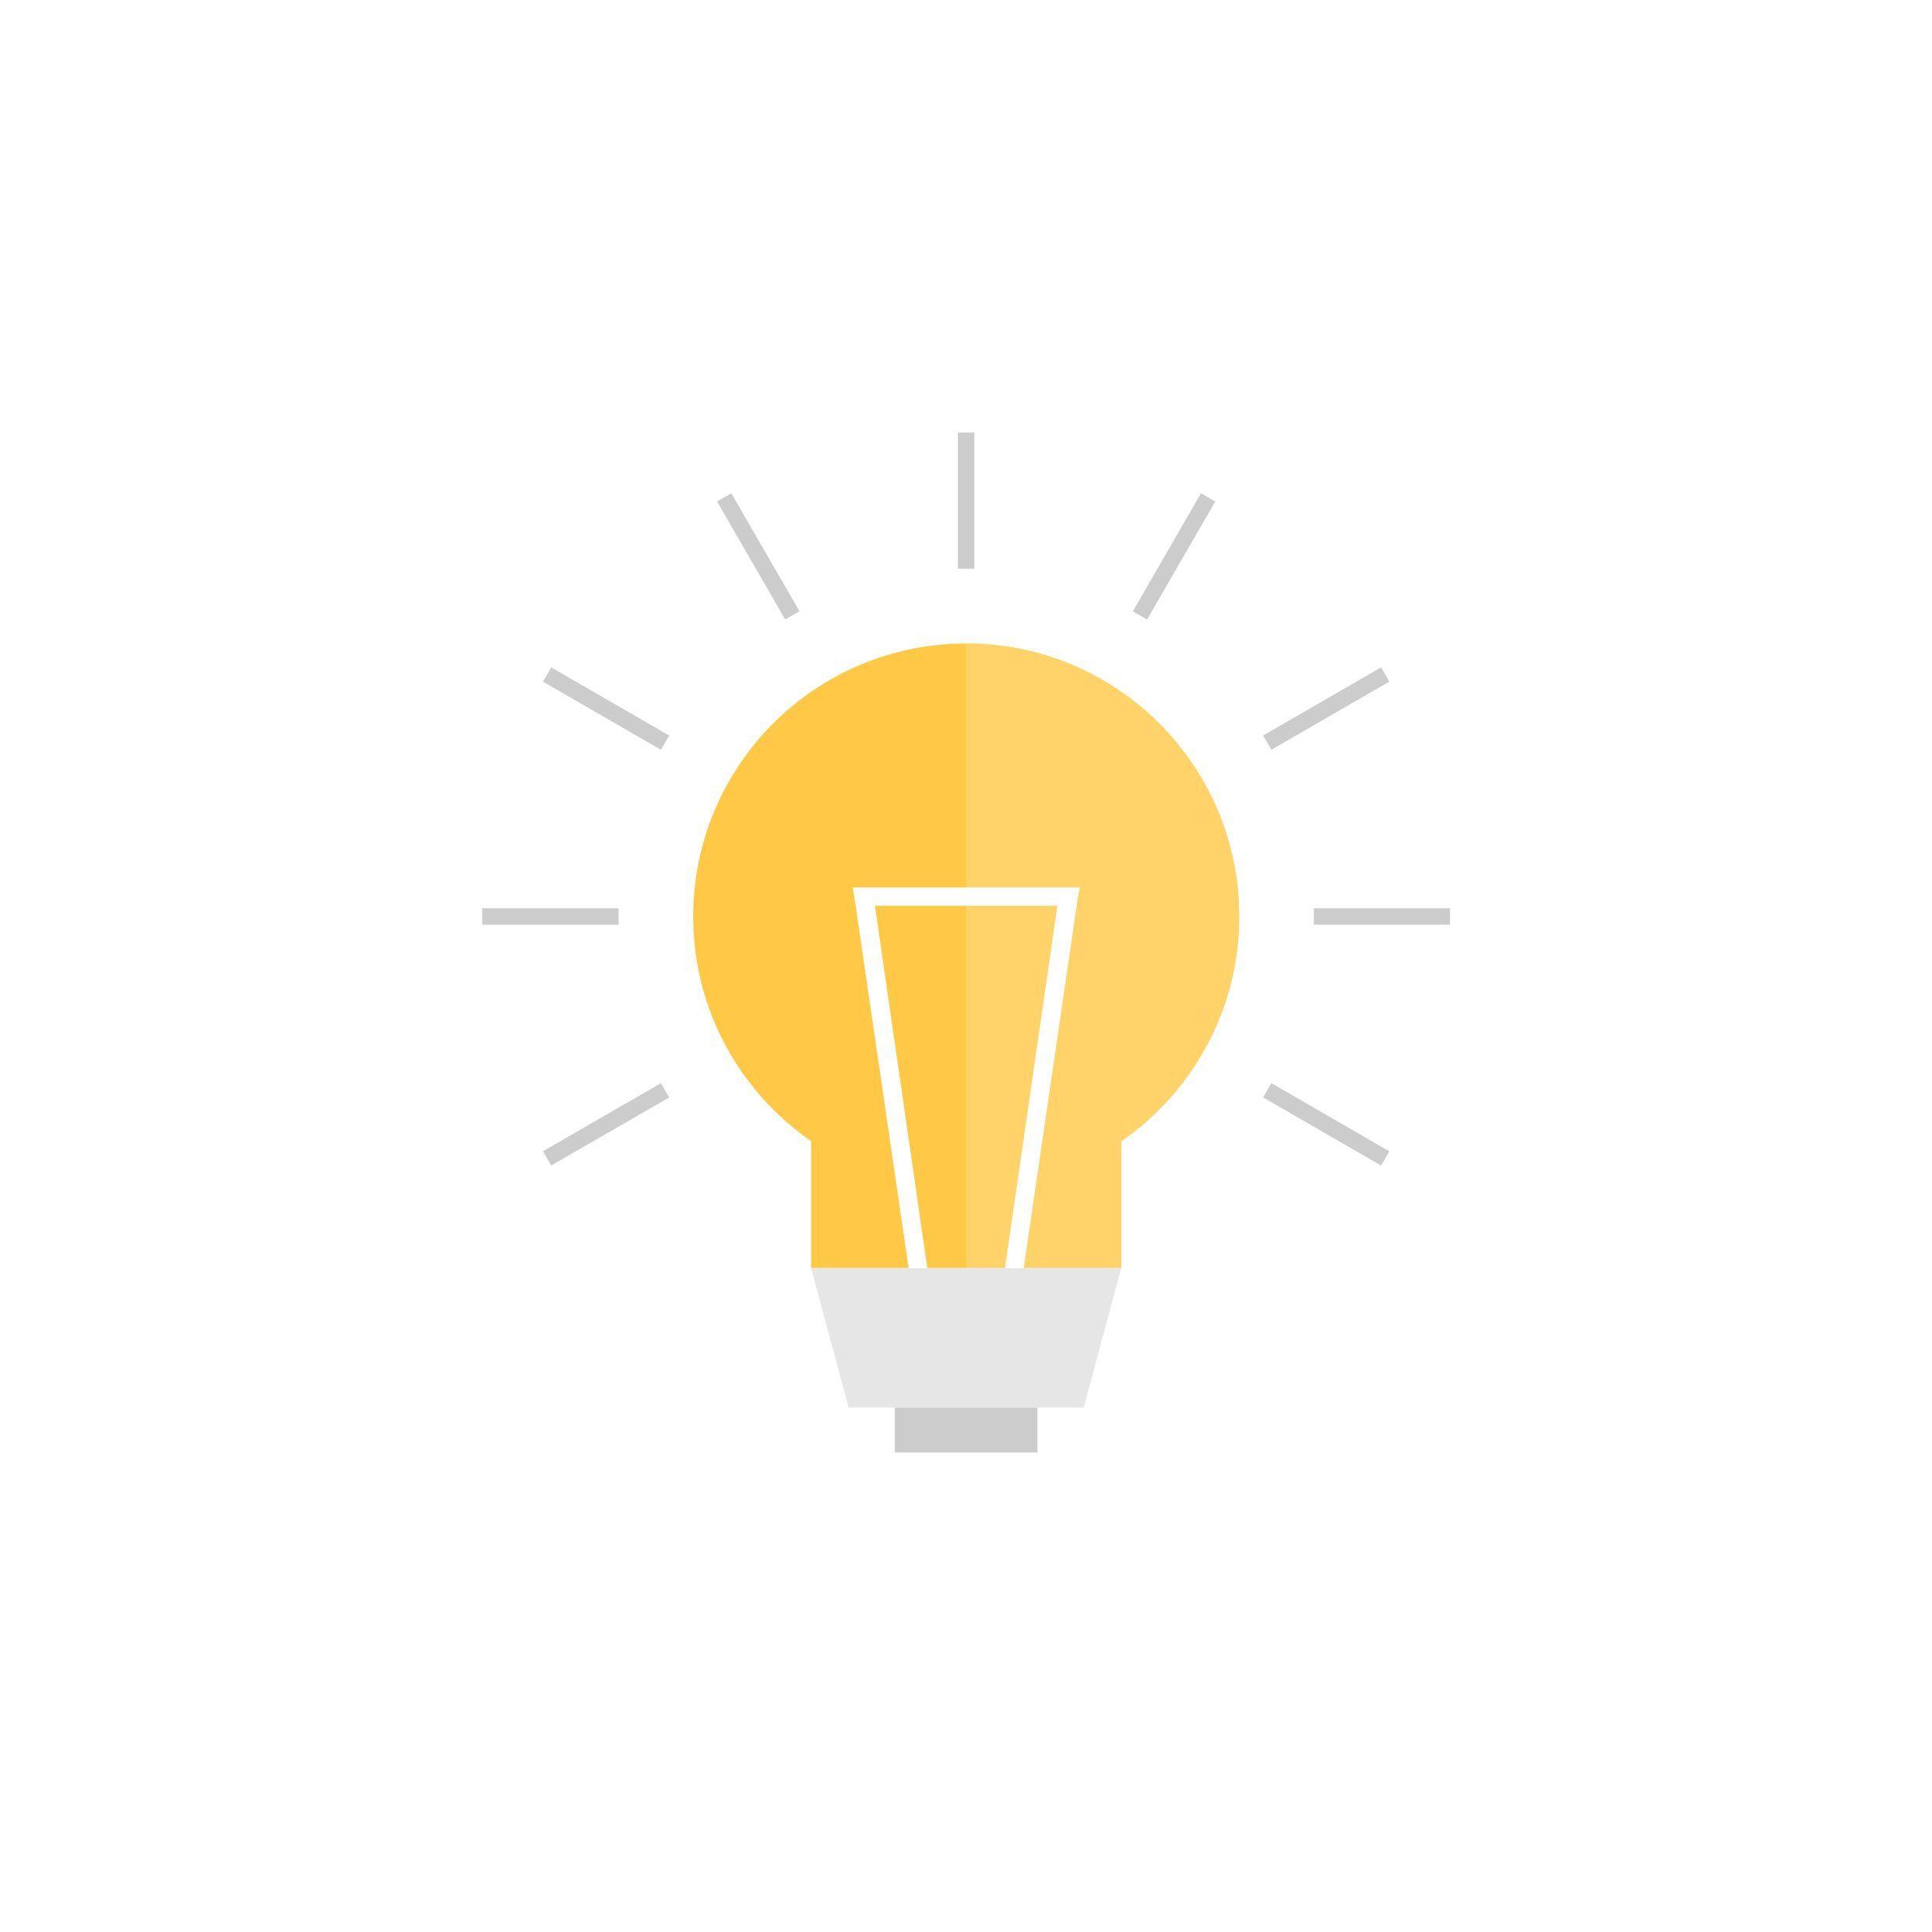 lightbulb idea concept